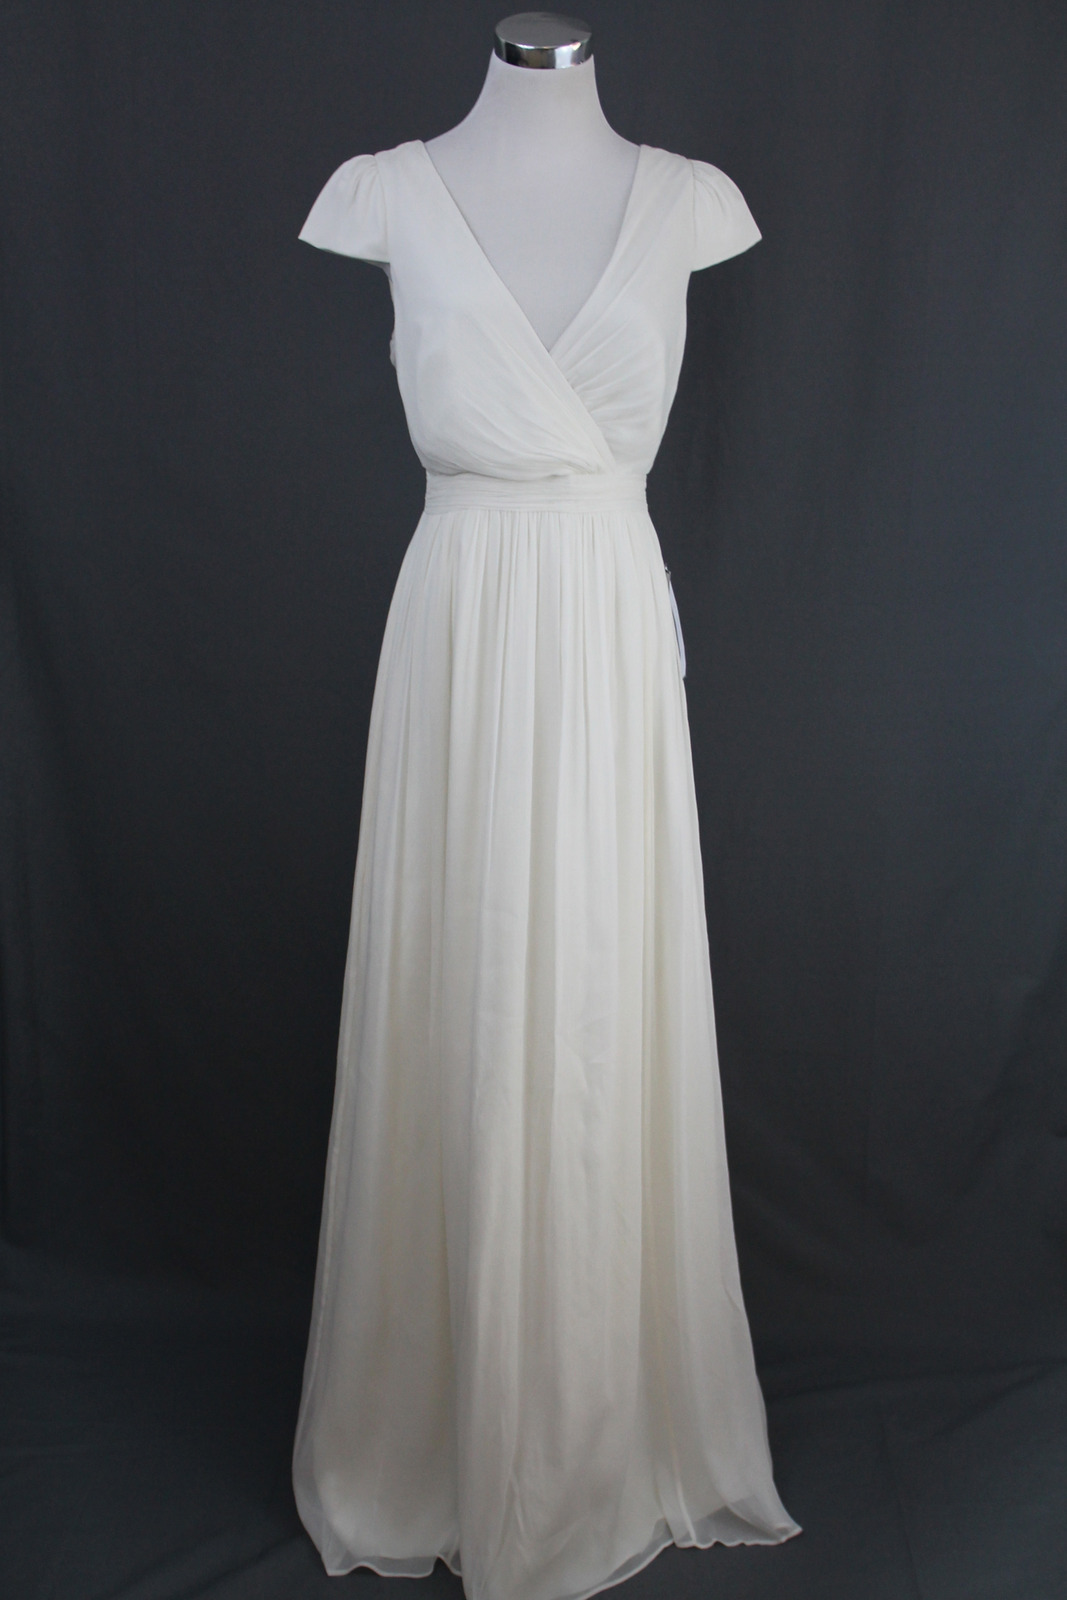 j crew wedding dress NEW J Crew Silk Chiffon Mirabelle Gown Ivory NWT Bridal Wedding main image